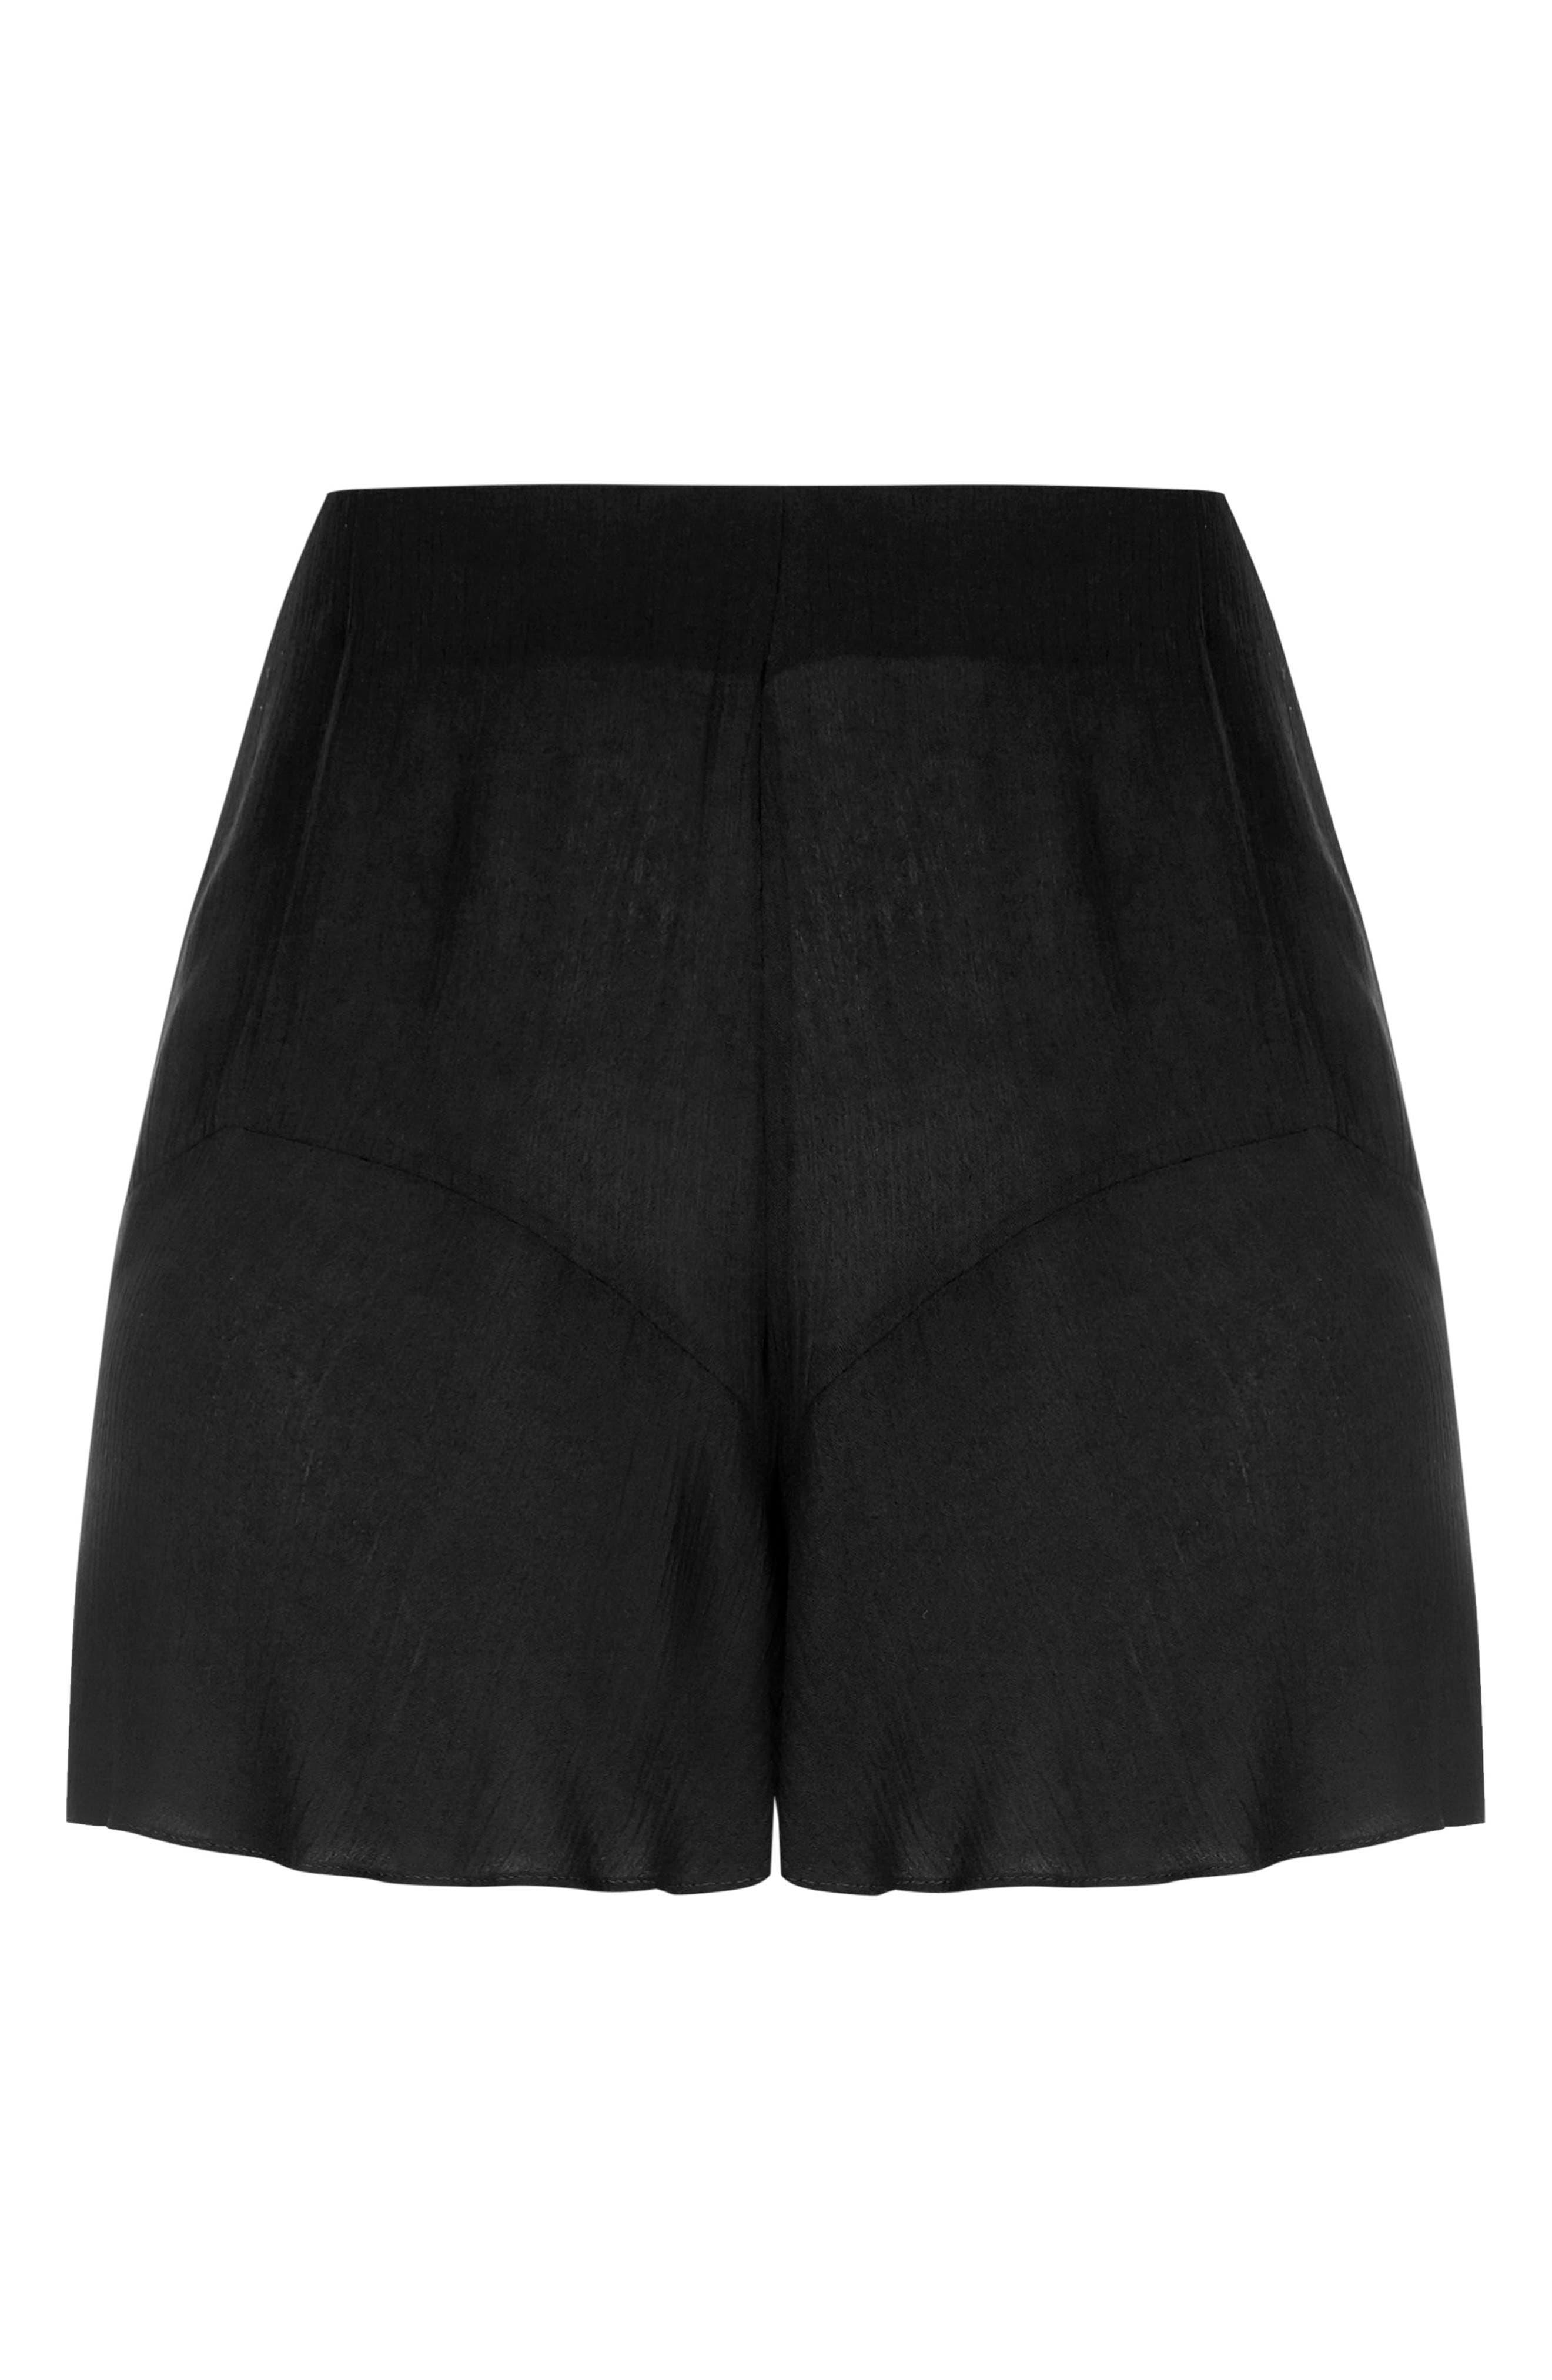 Sweet Frill Shorts,                             Alternate thumbnail 3, color,                             Black